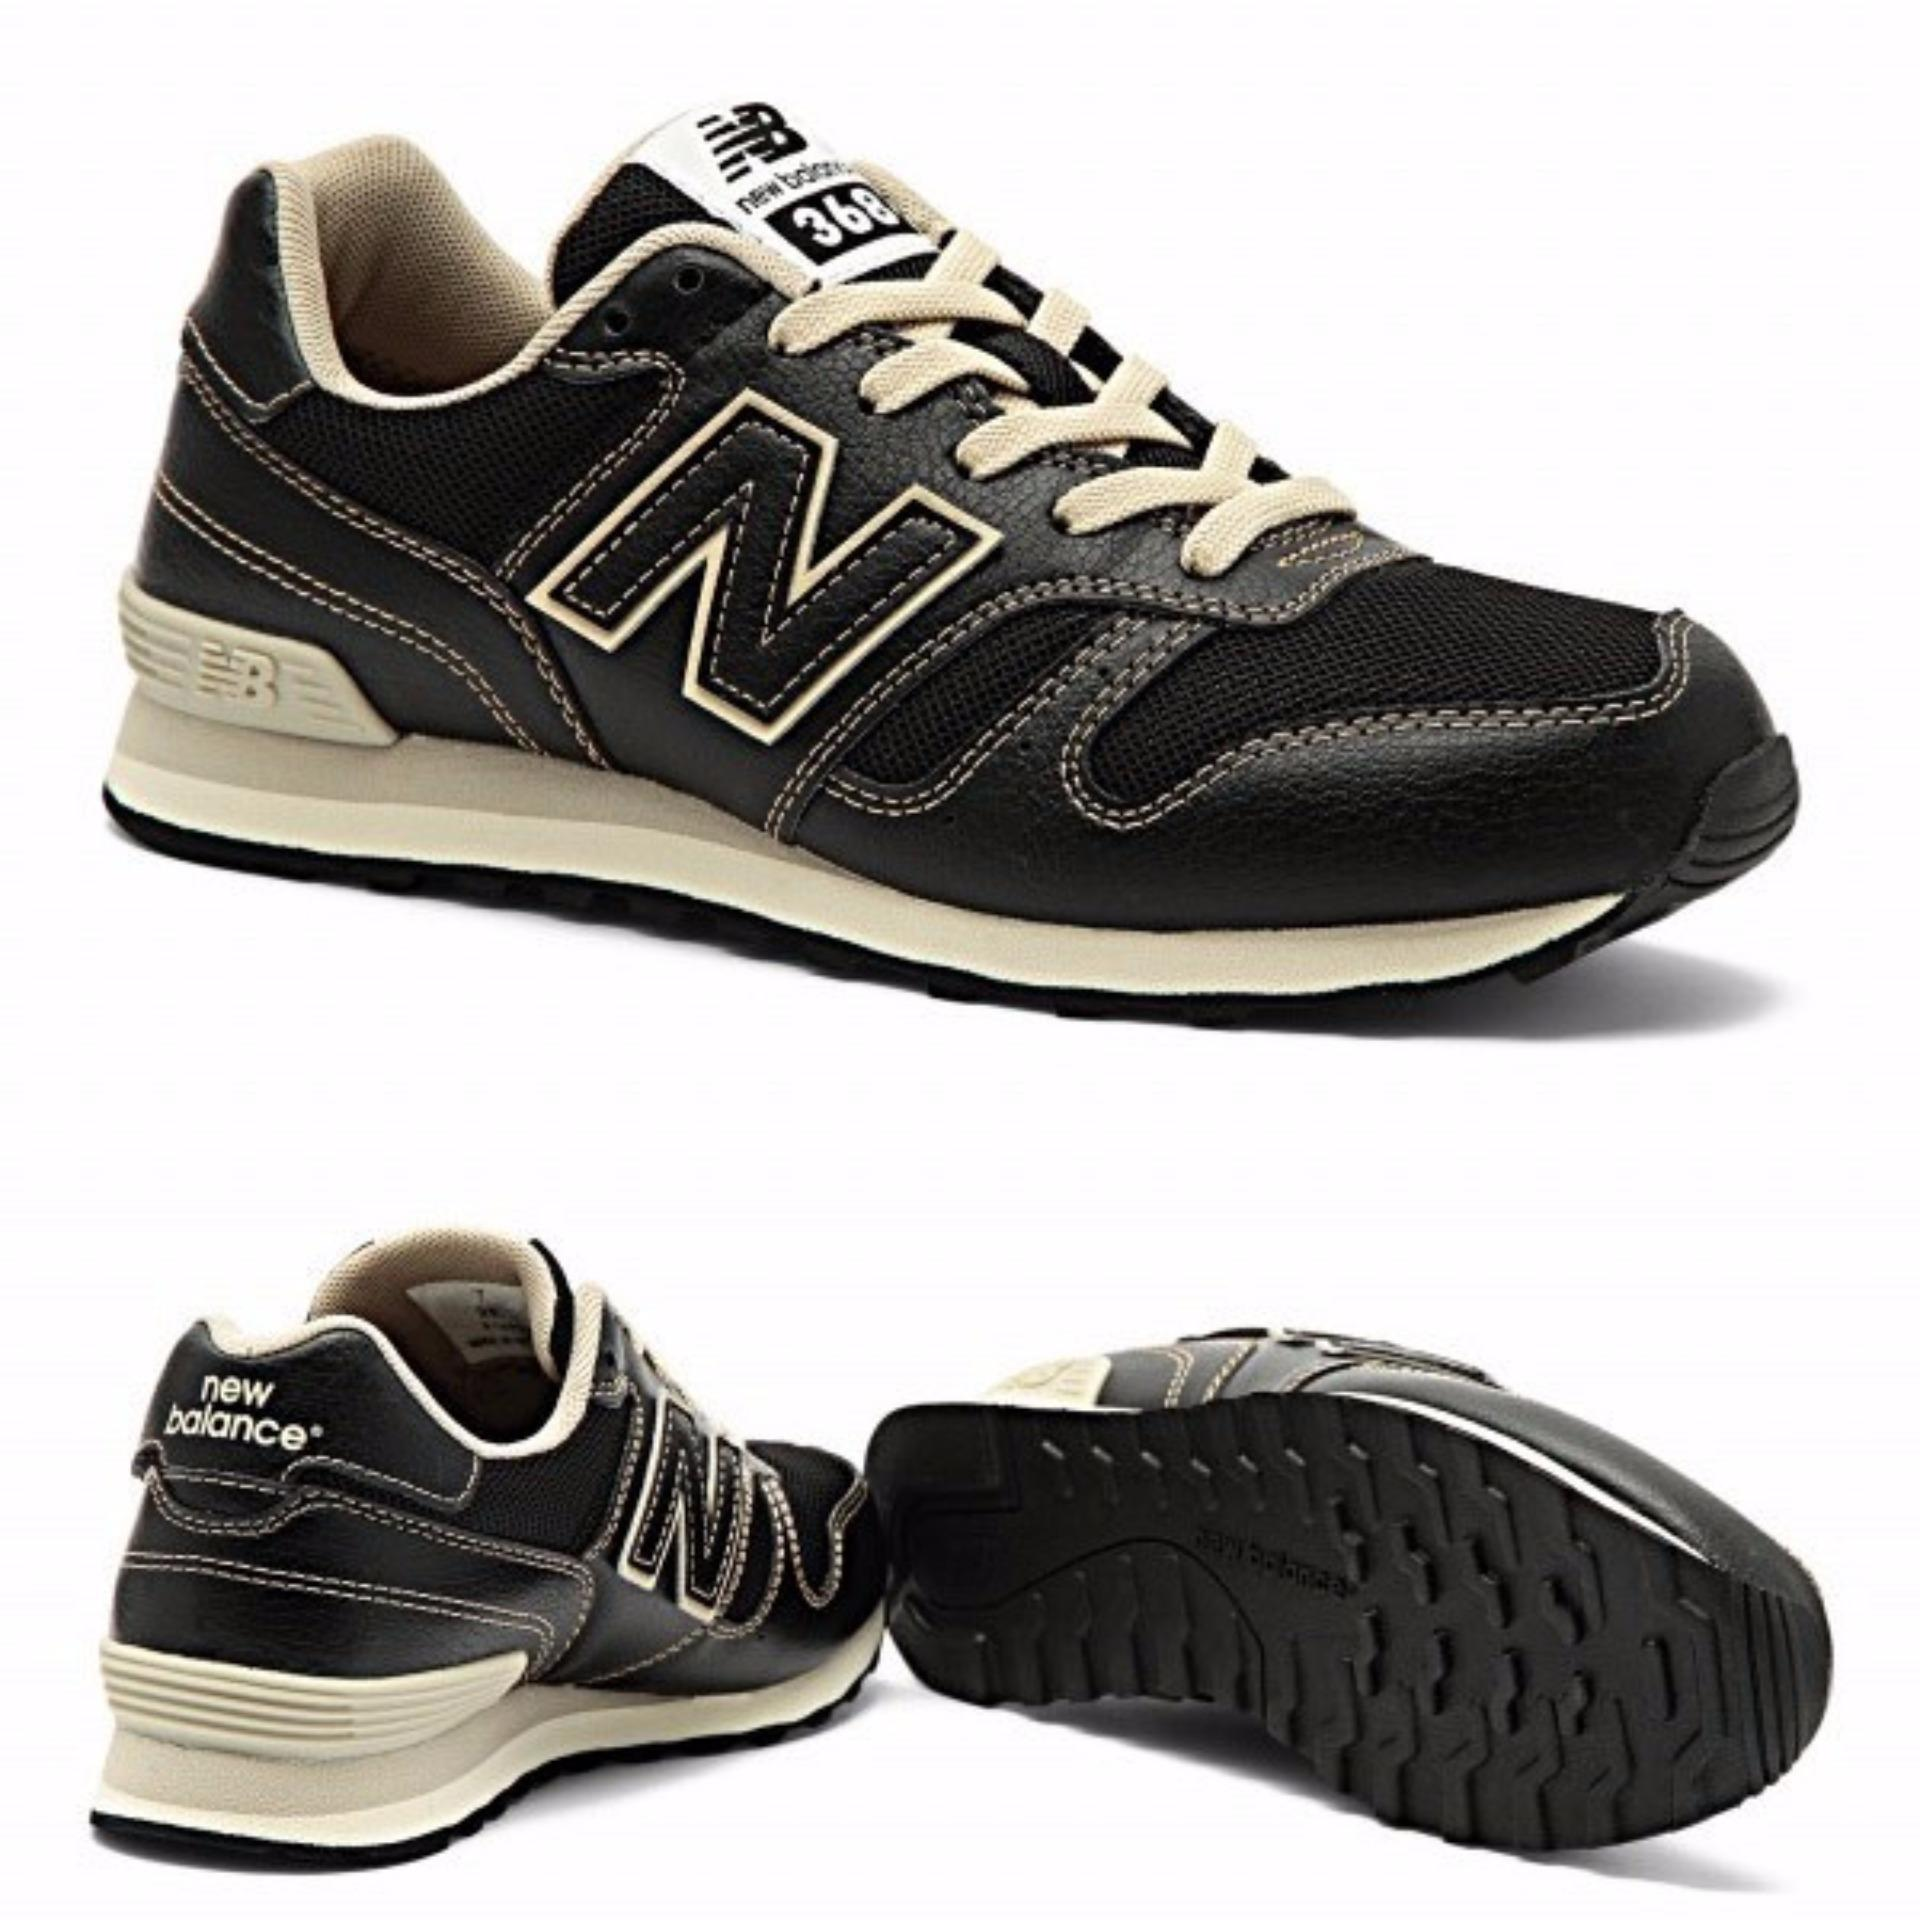 Beli New Balance 368 Sneakers Black W368Jbk Kredit